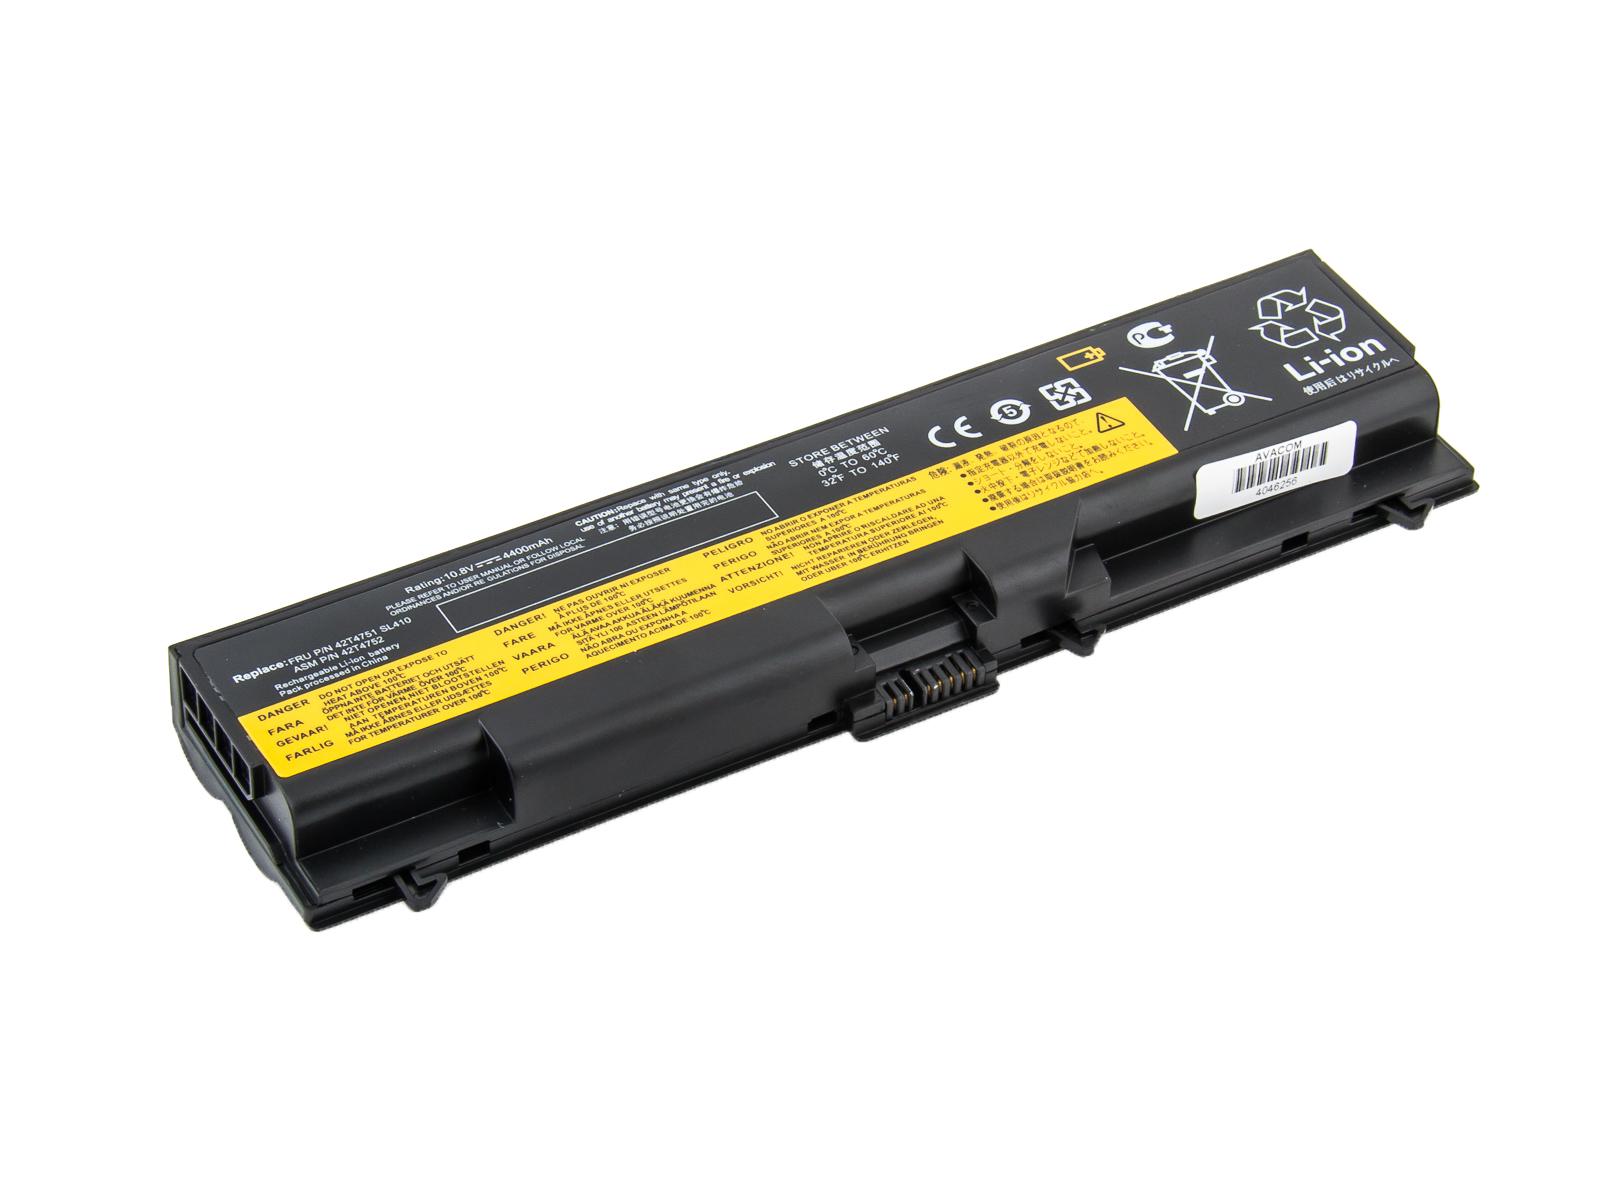 "AVACOM baterie pro Lenovo ThinkPad T410/SL510/Edge 14"", Edge 15"" Li-Ion 10,8V 4400mAh"